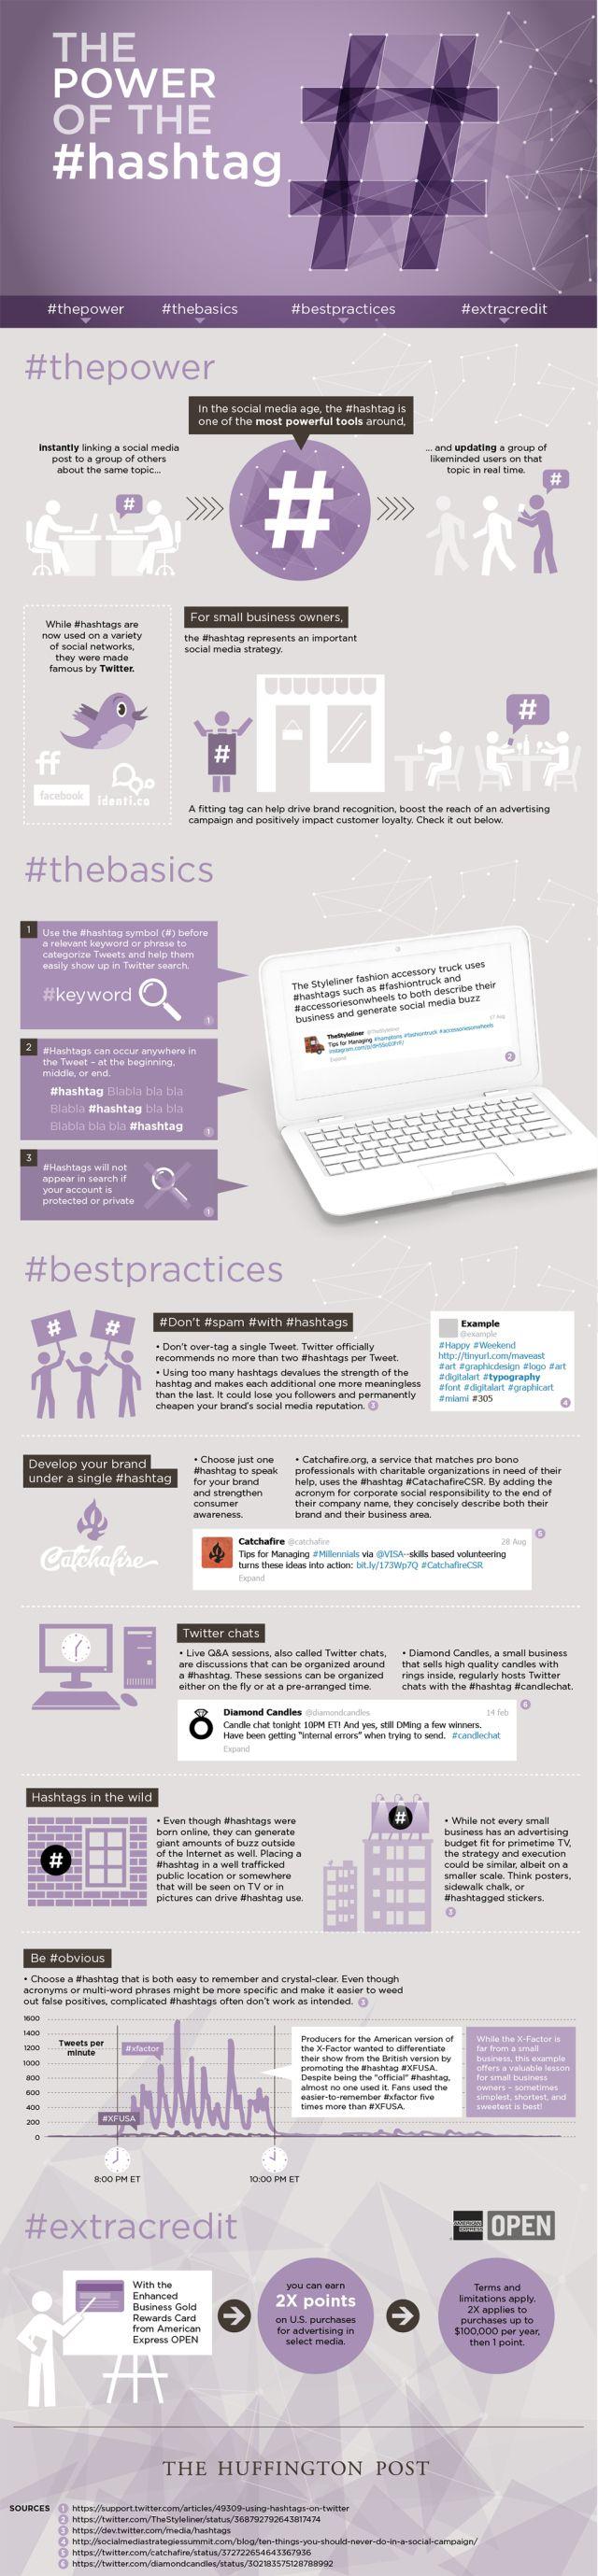 Hashtag. #SMM #infographic #SocialMedia